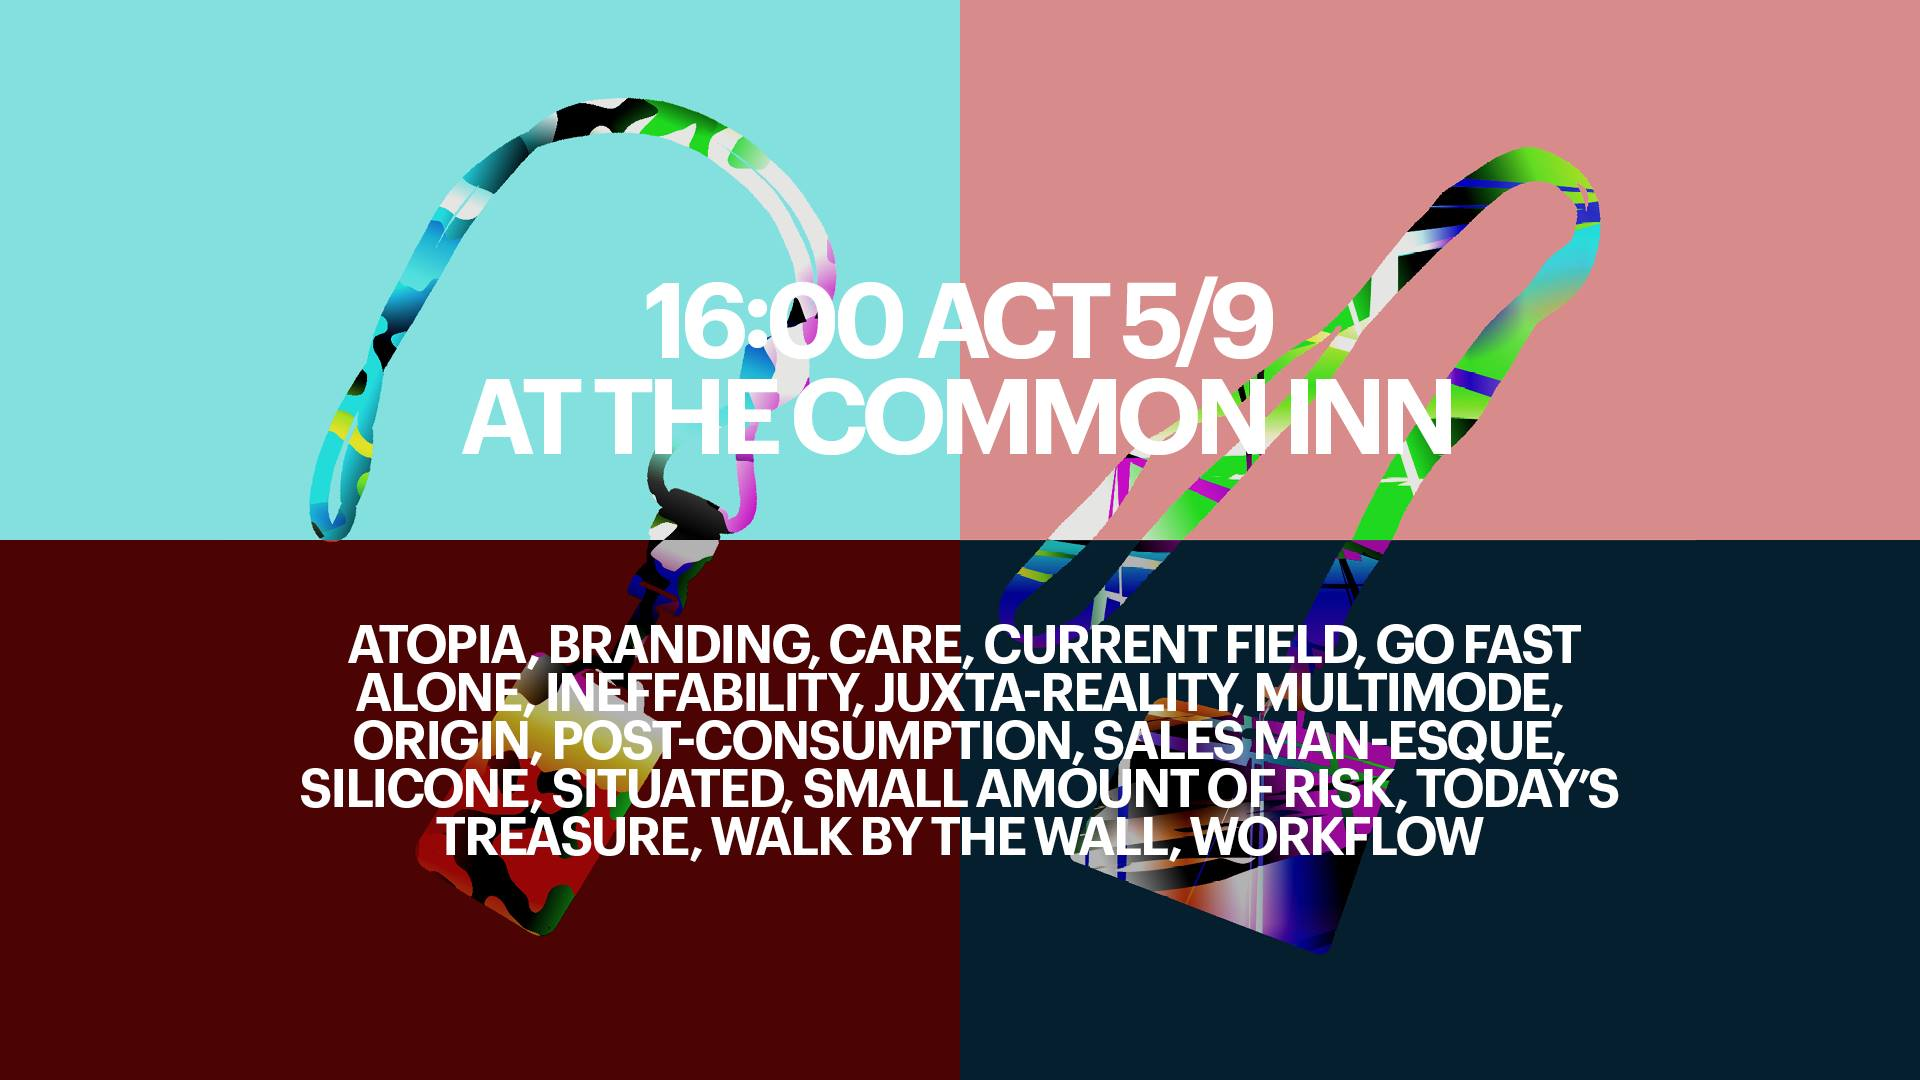 The Common Inn -